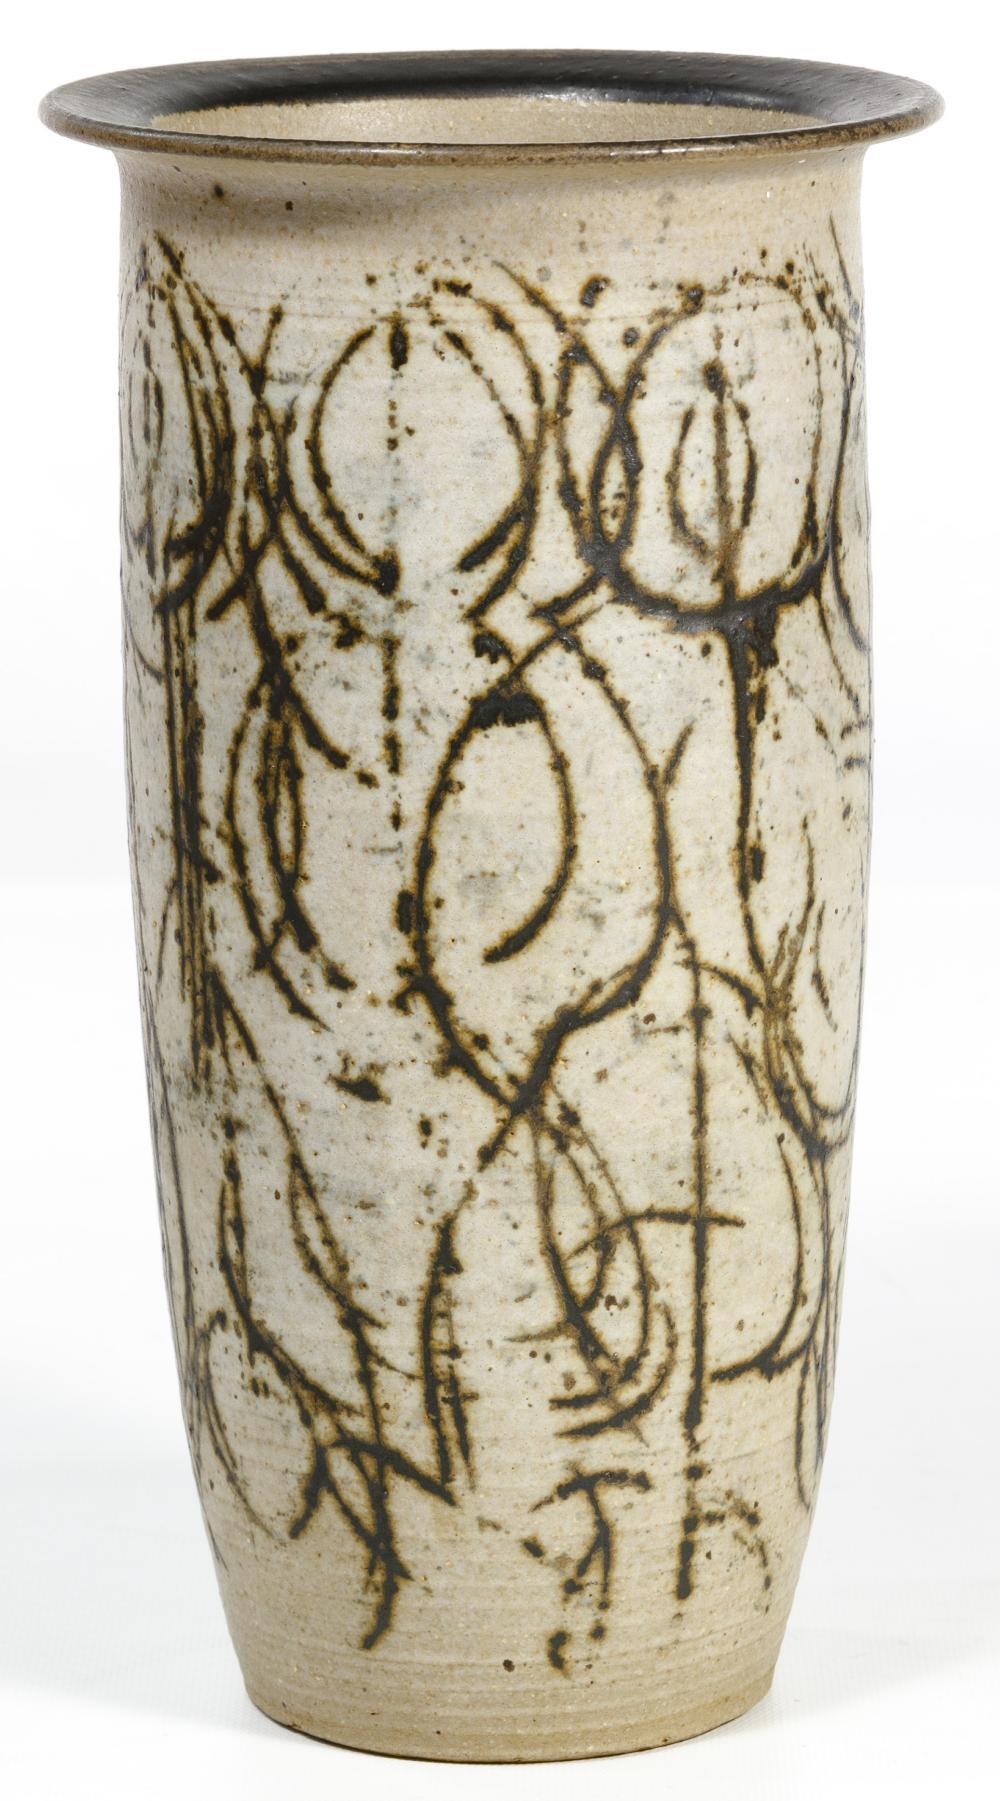 Clyde Burt (American, 1922-1981) Pottery Vase